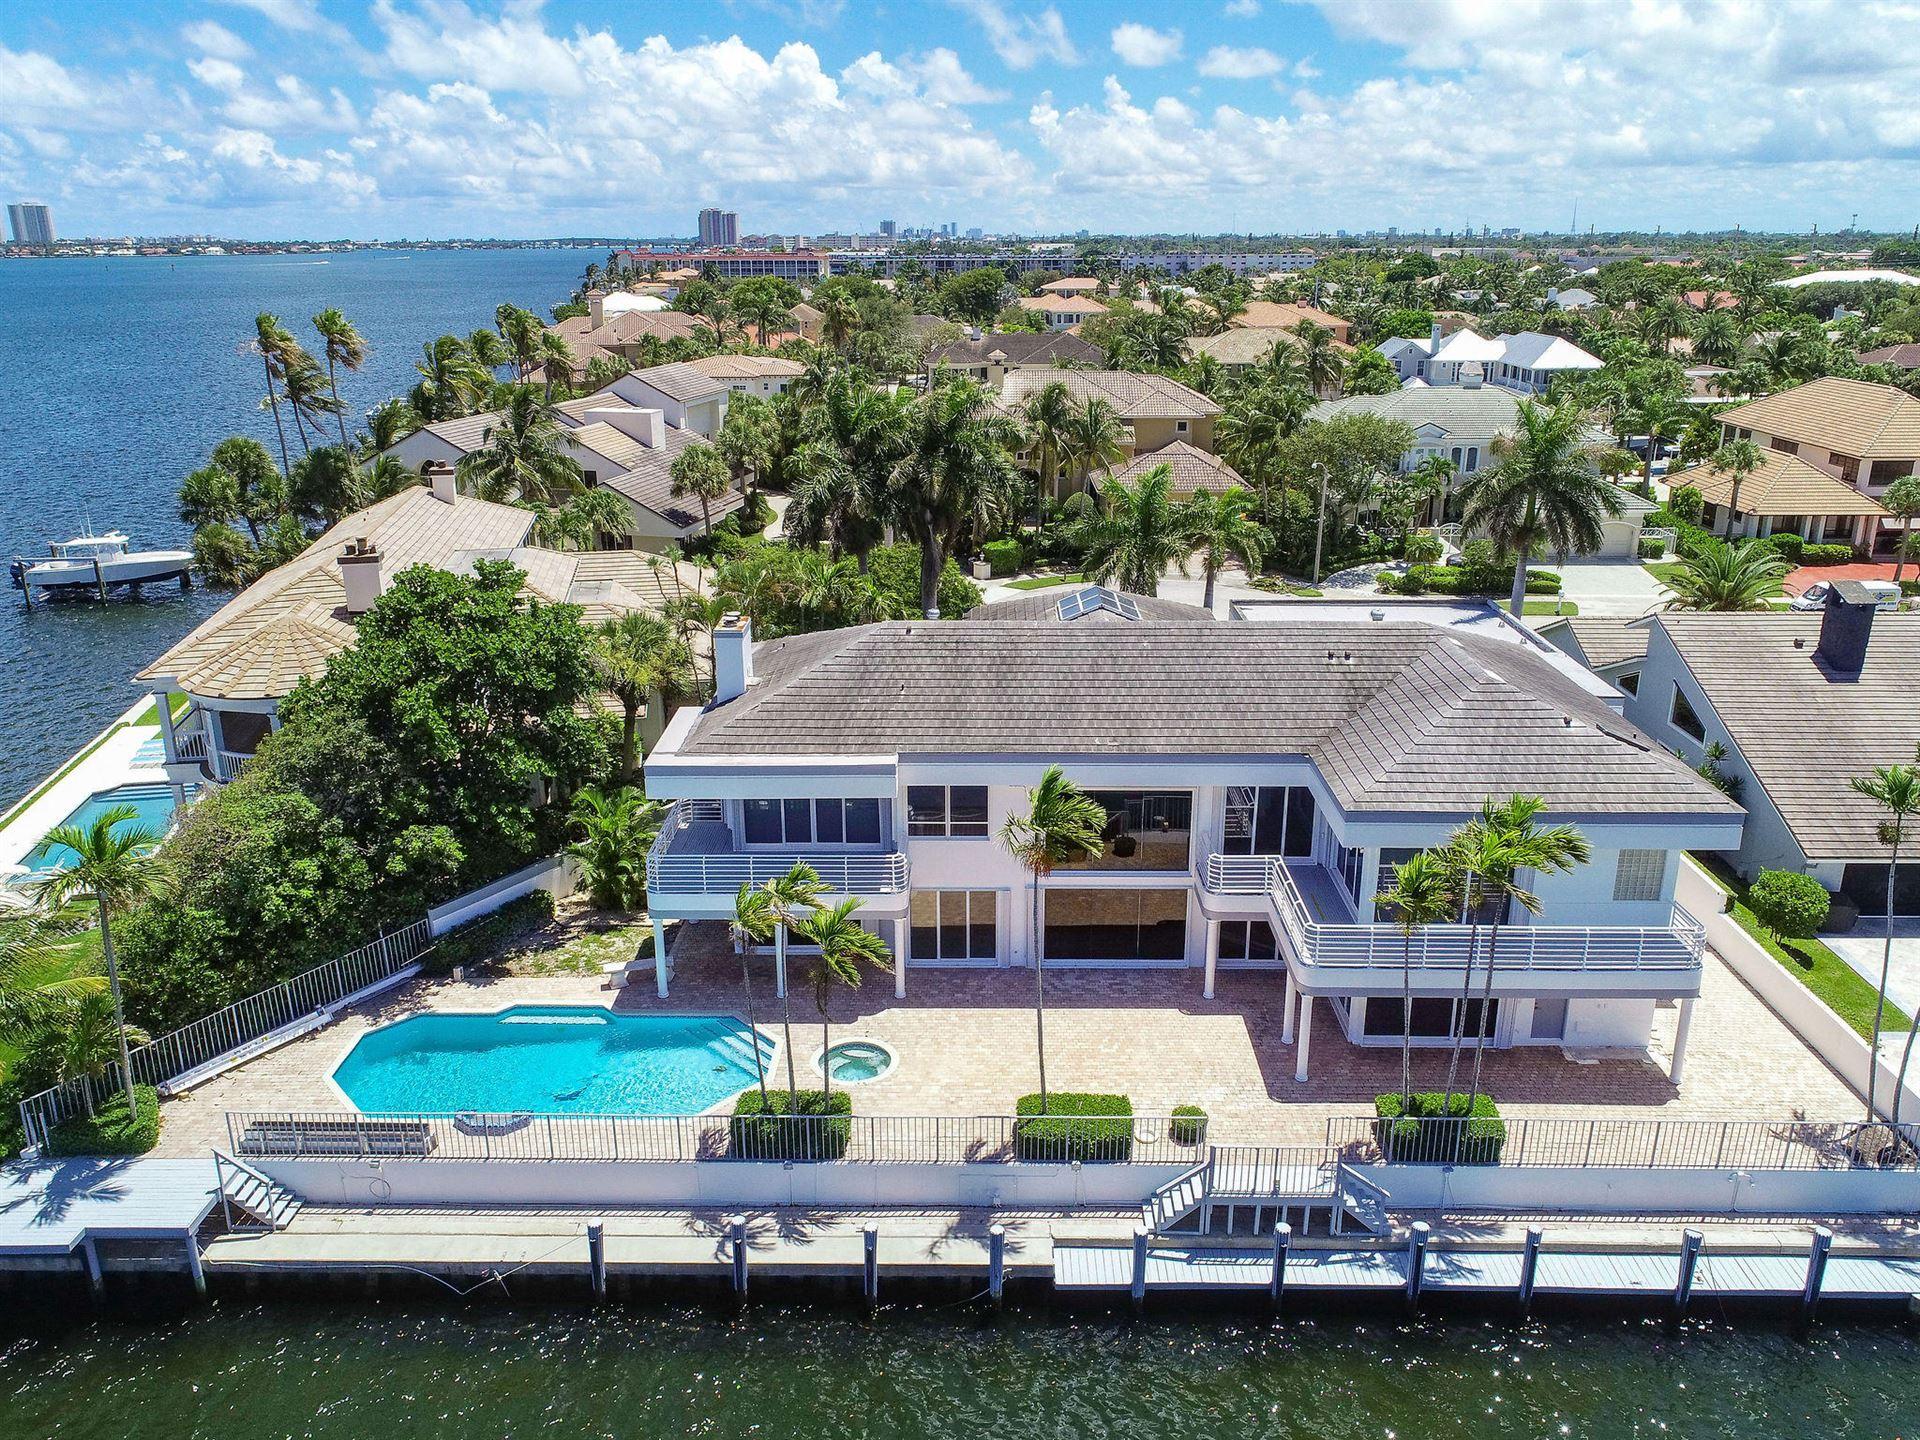 107 Ebbtide Drive, North Palm Beach, FL 33408 - #: RX-10667910